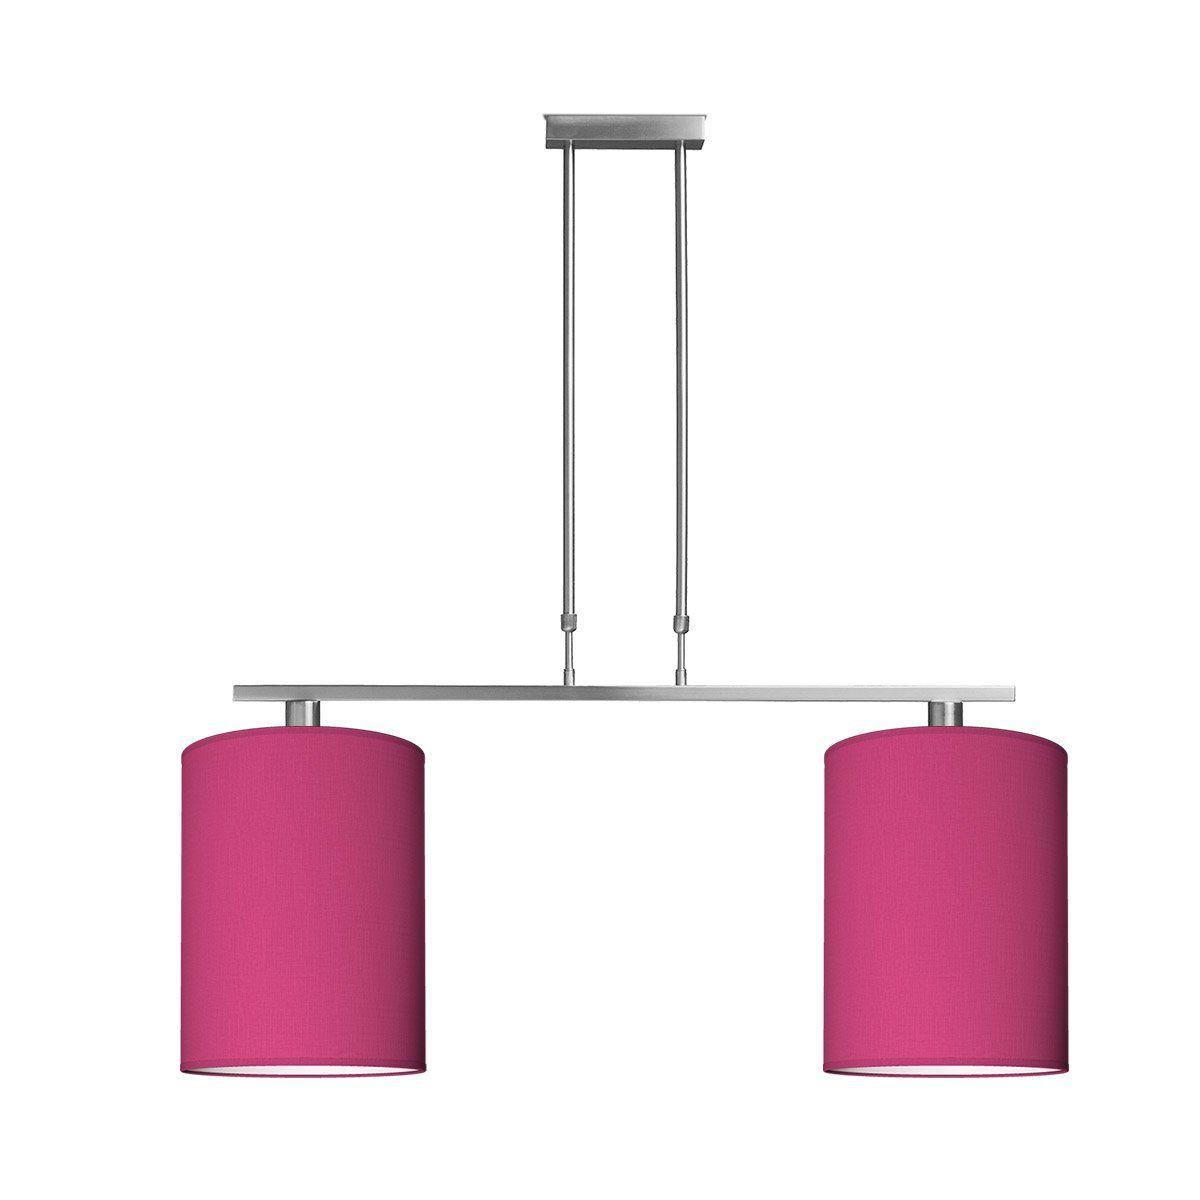 hanglamp bridge 2 tube Ø 30 cm - roze